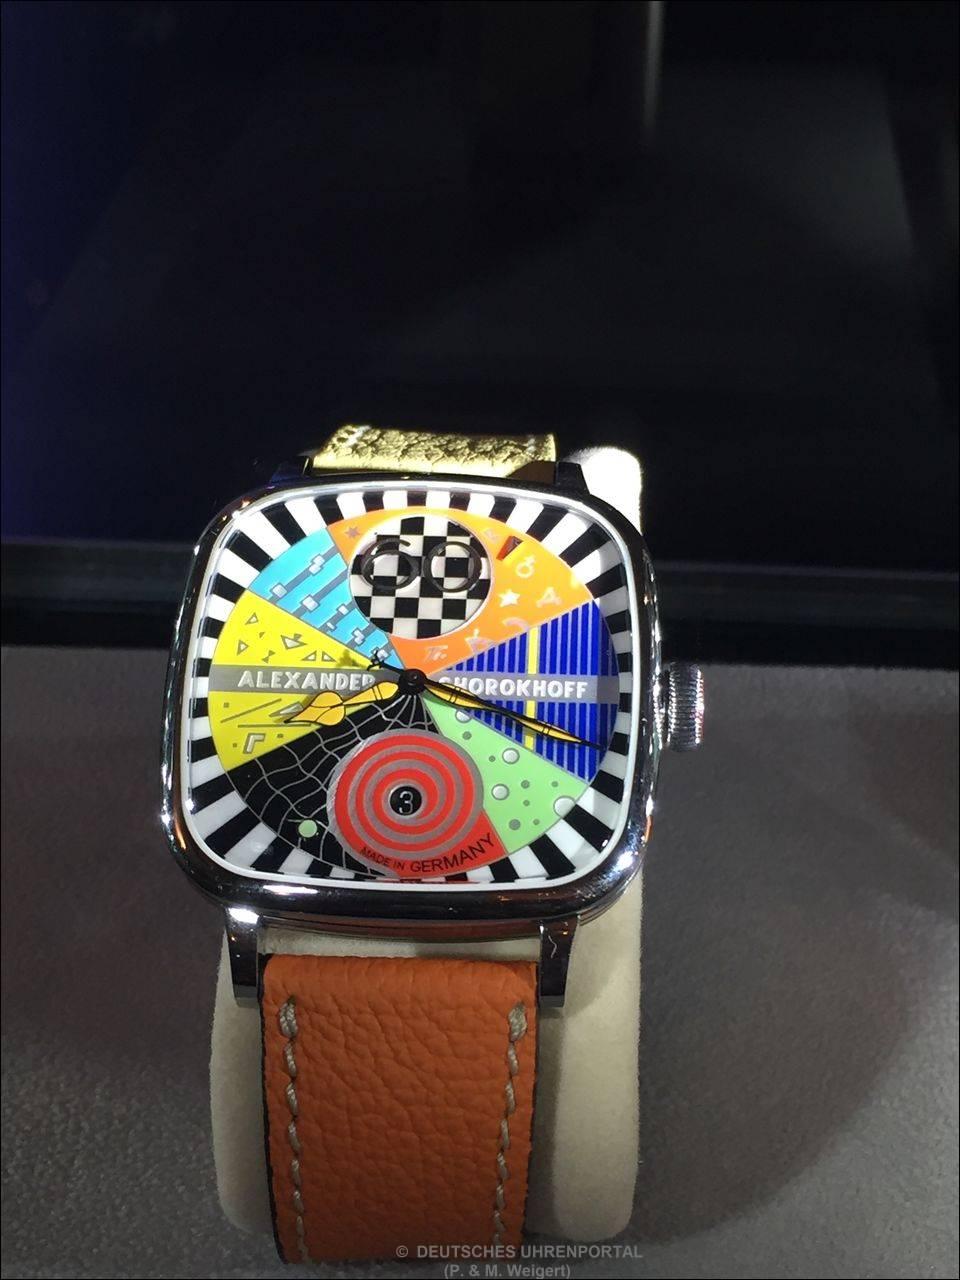 Alexander Shorokhoff Uhrenmanufaktur präsentiert das Modell Kandy Avantgarde